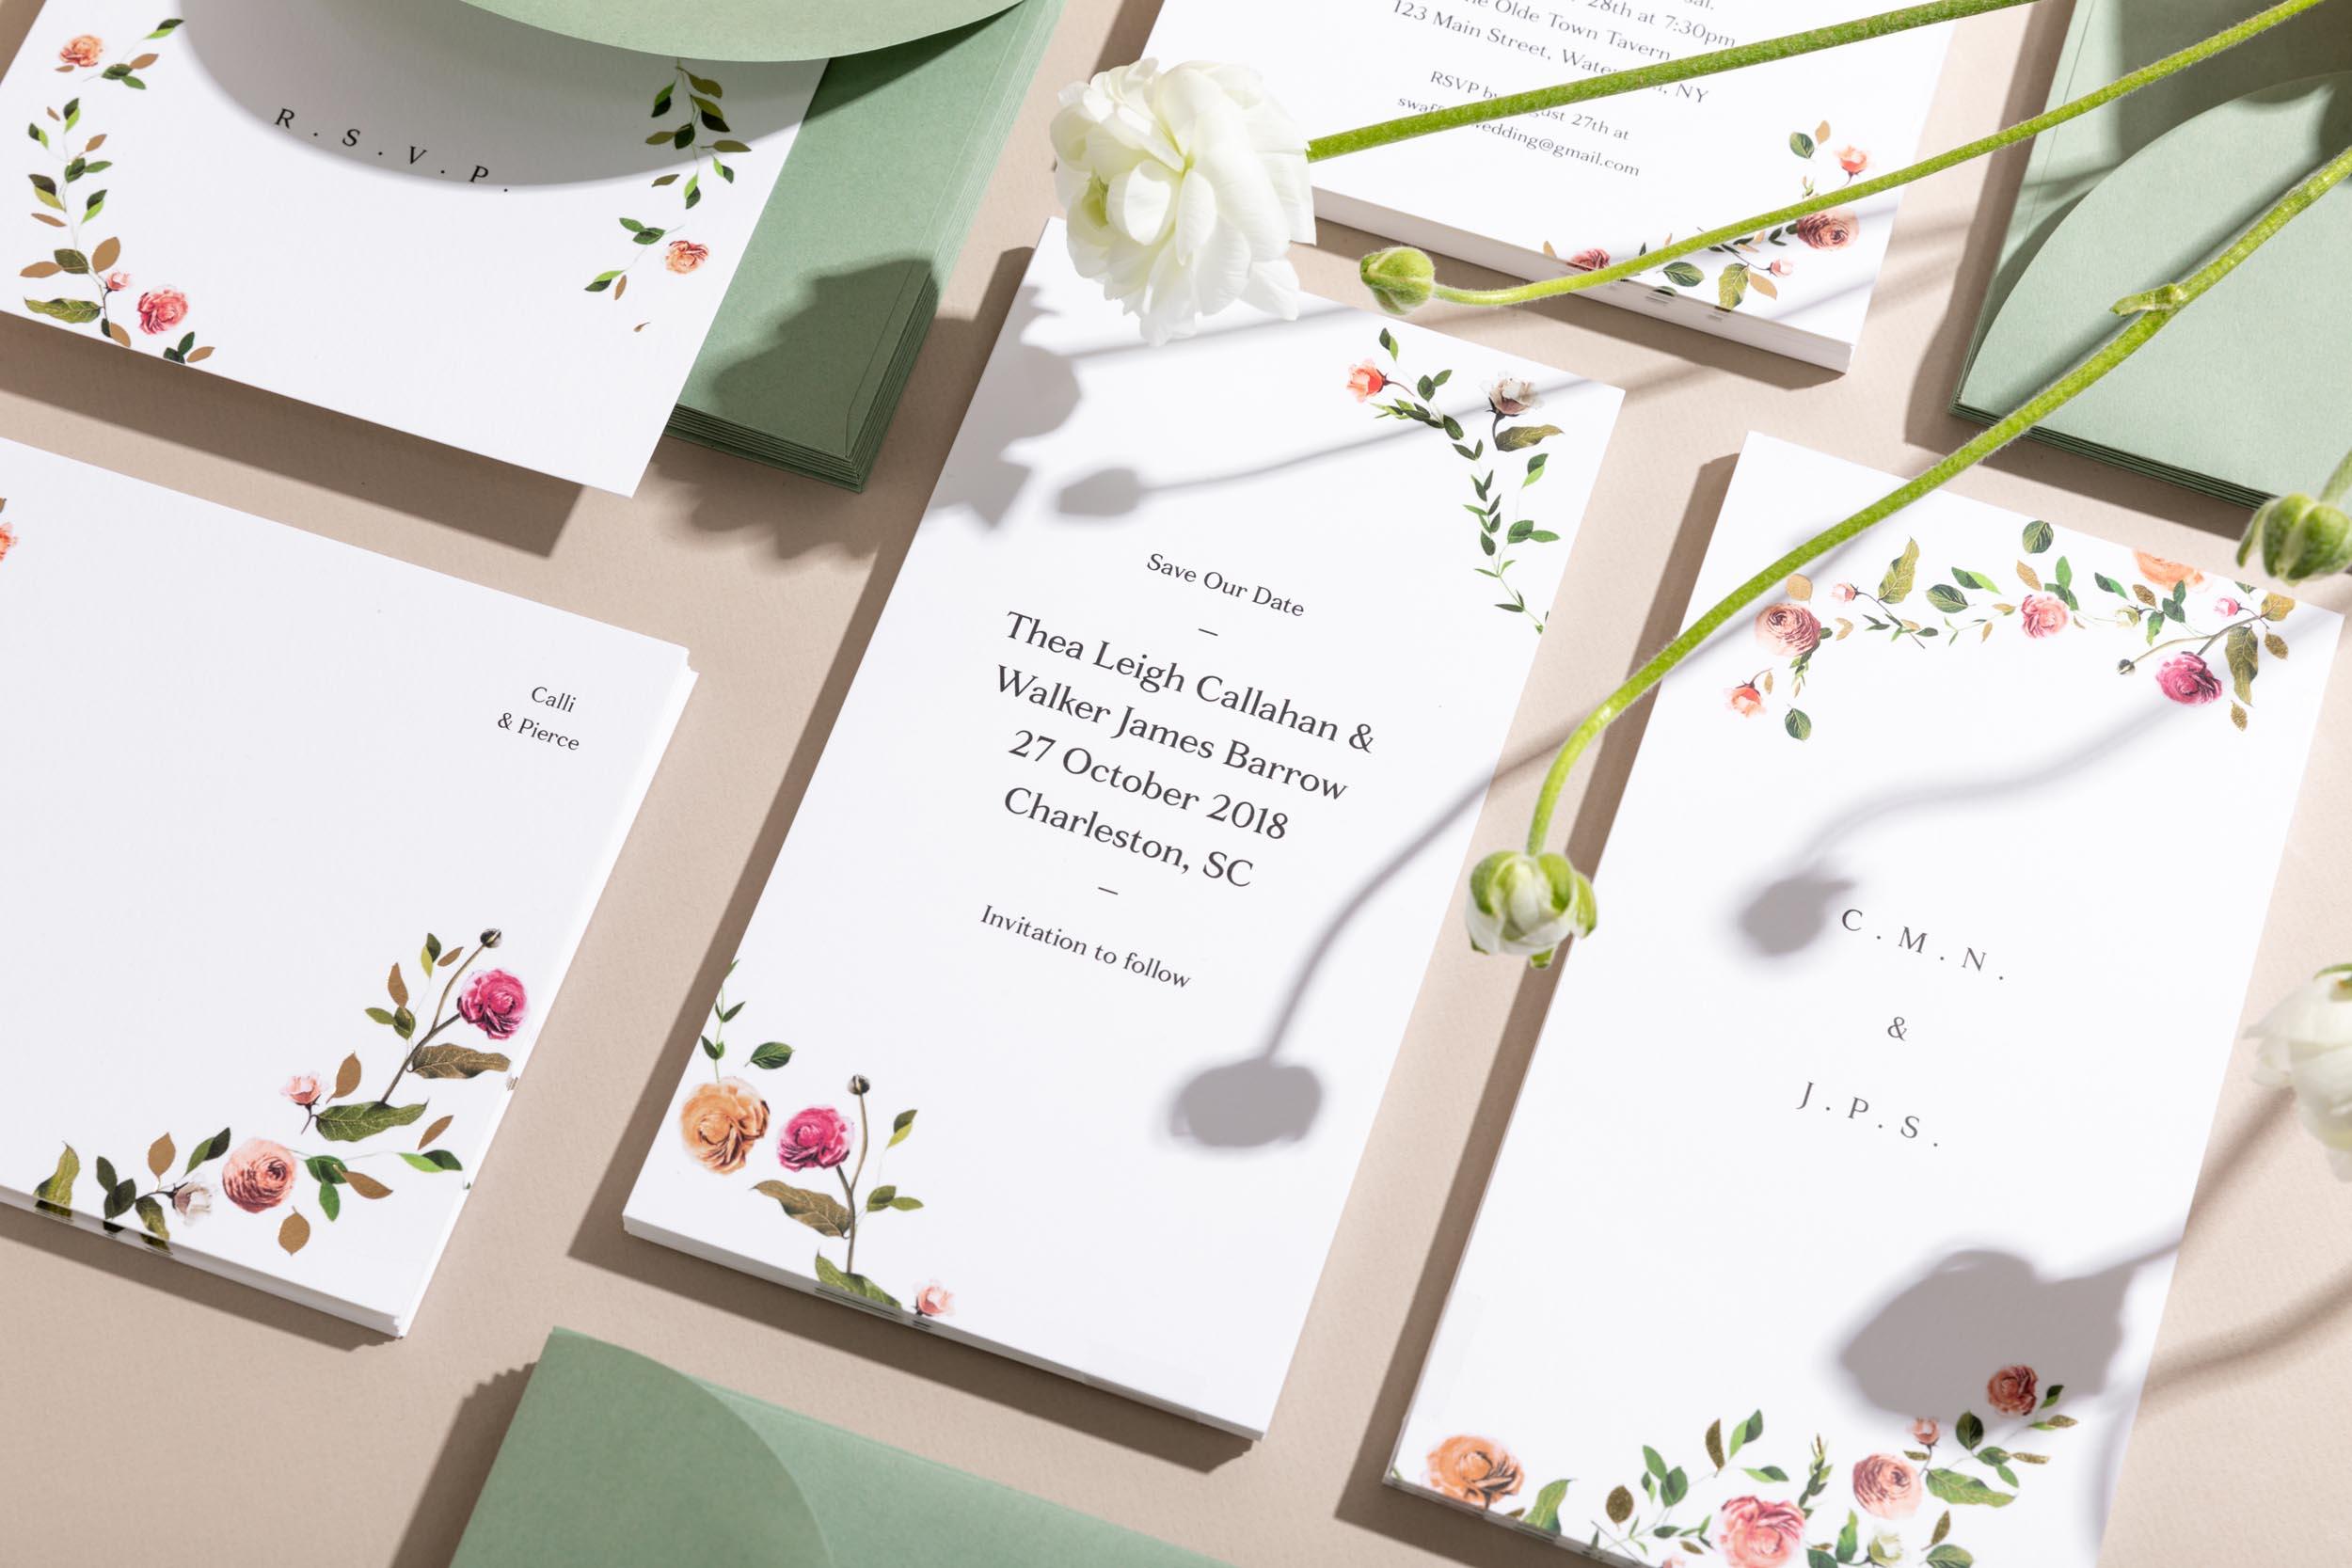 wedding-suite-venamour-studio-collection-grid-06